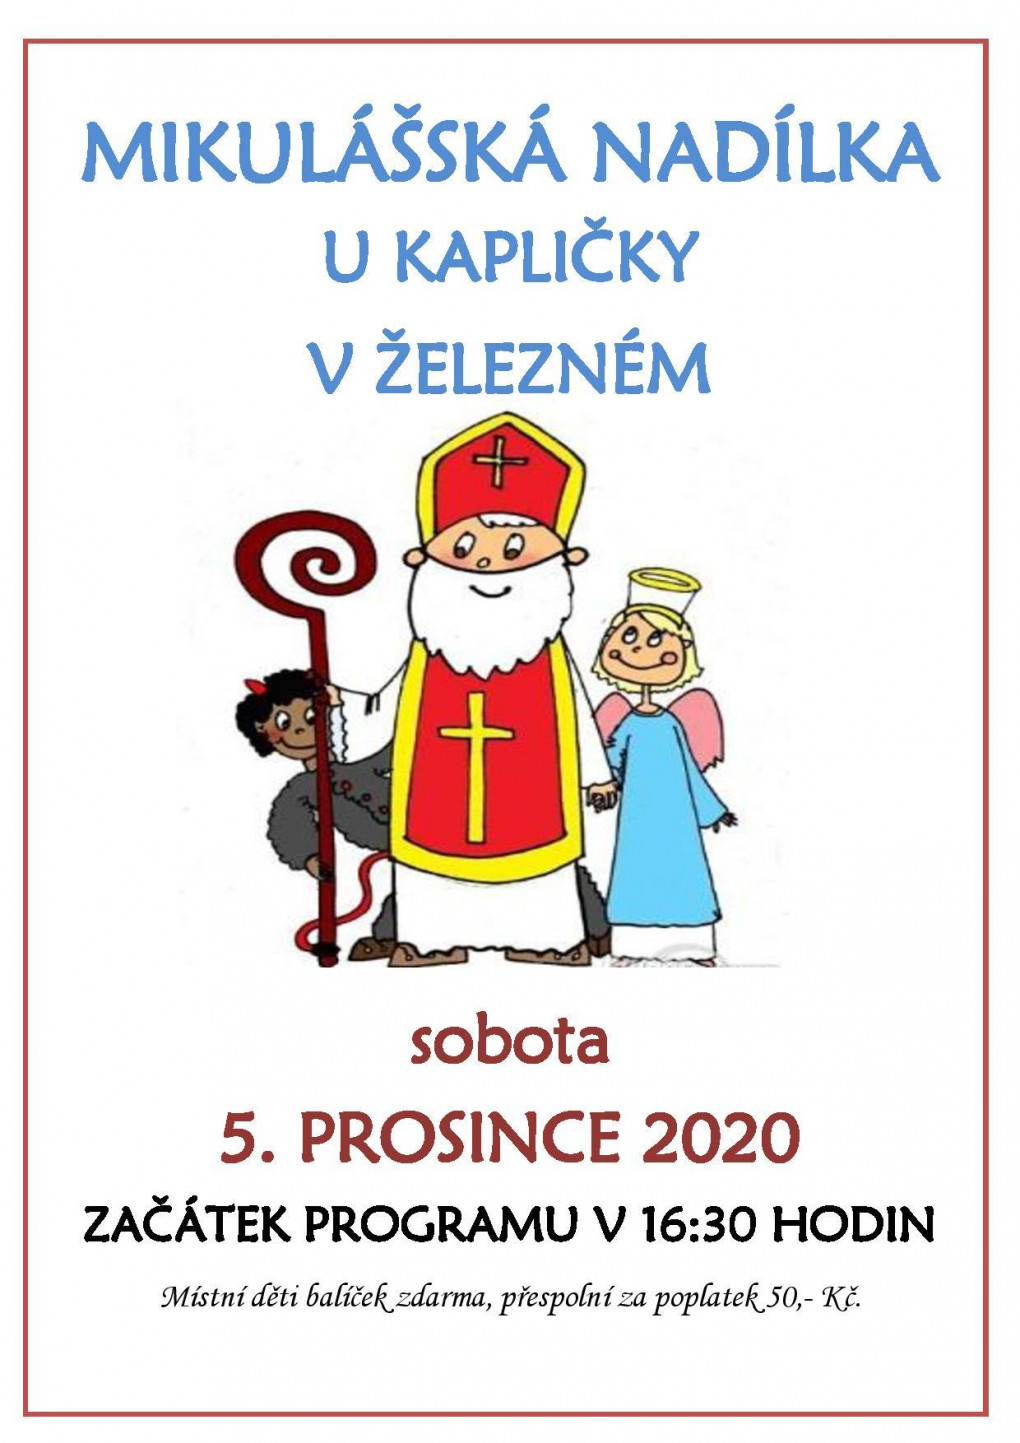 mikulasska_u_kaplicky_20-page-001.jpg